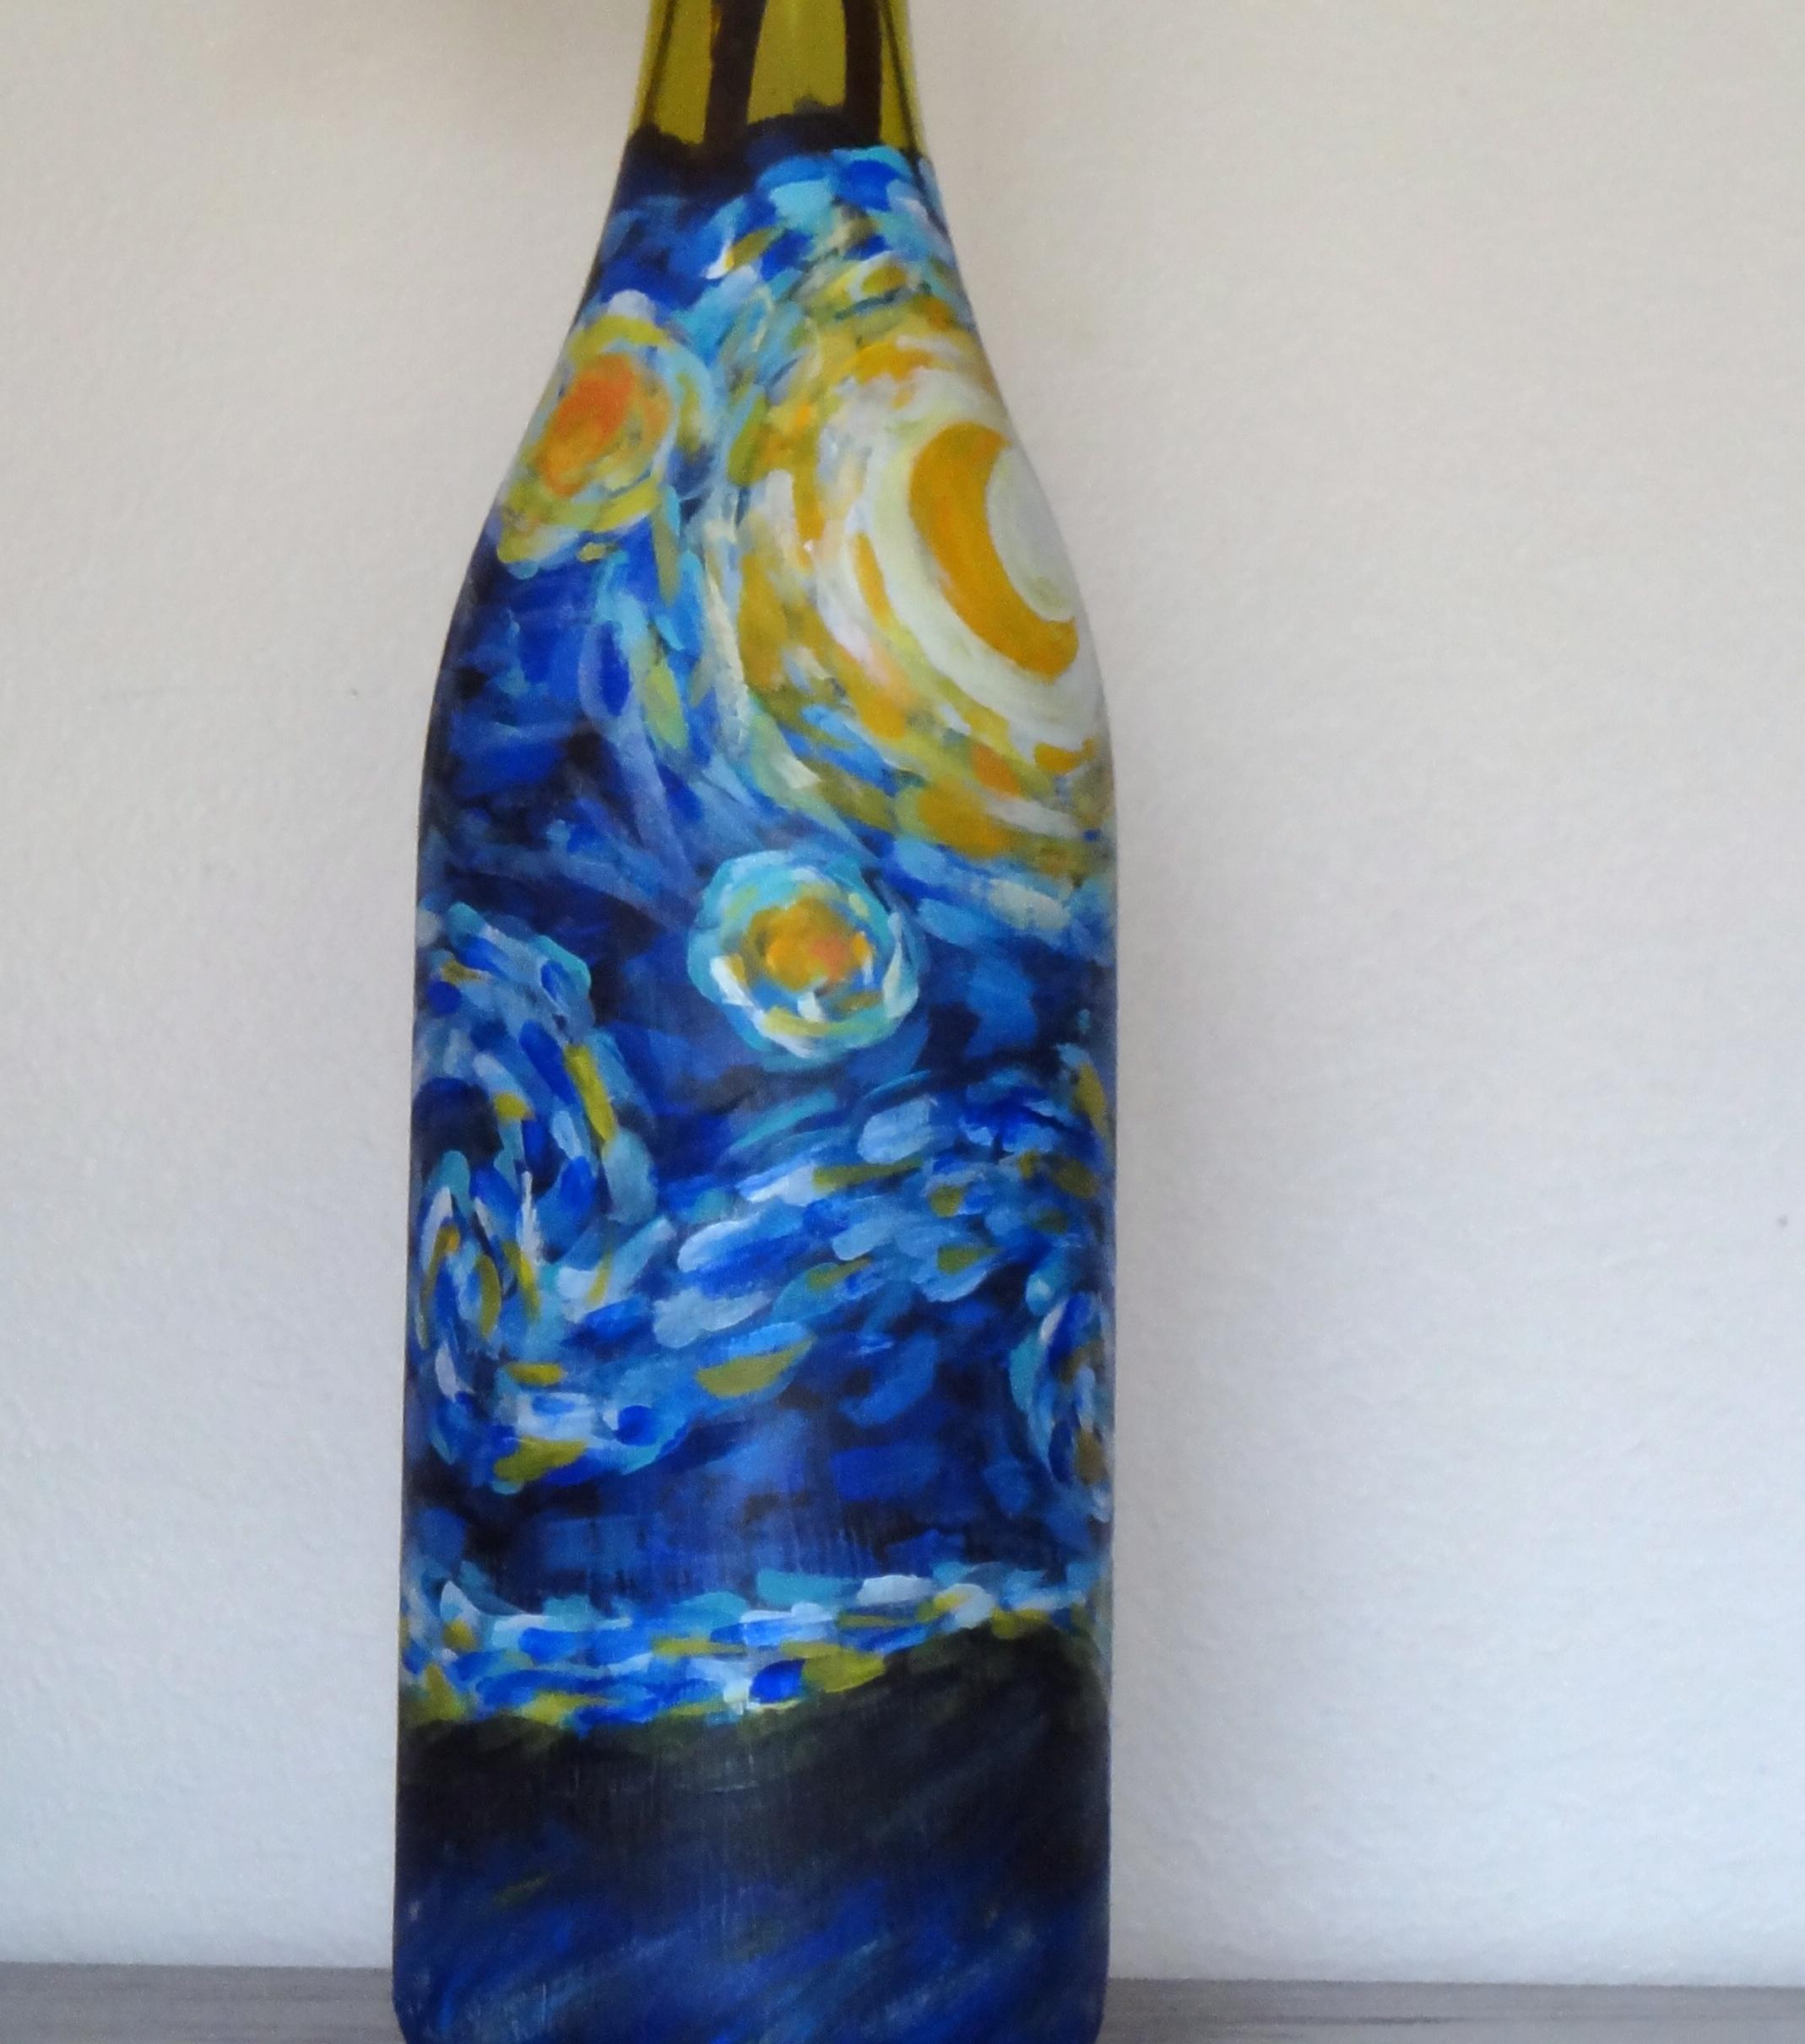 Starry Night Wine Bottle  When Life Gave Me Lemonade